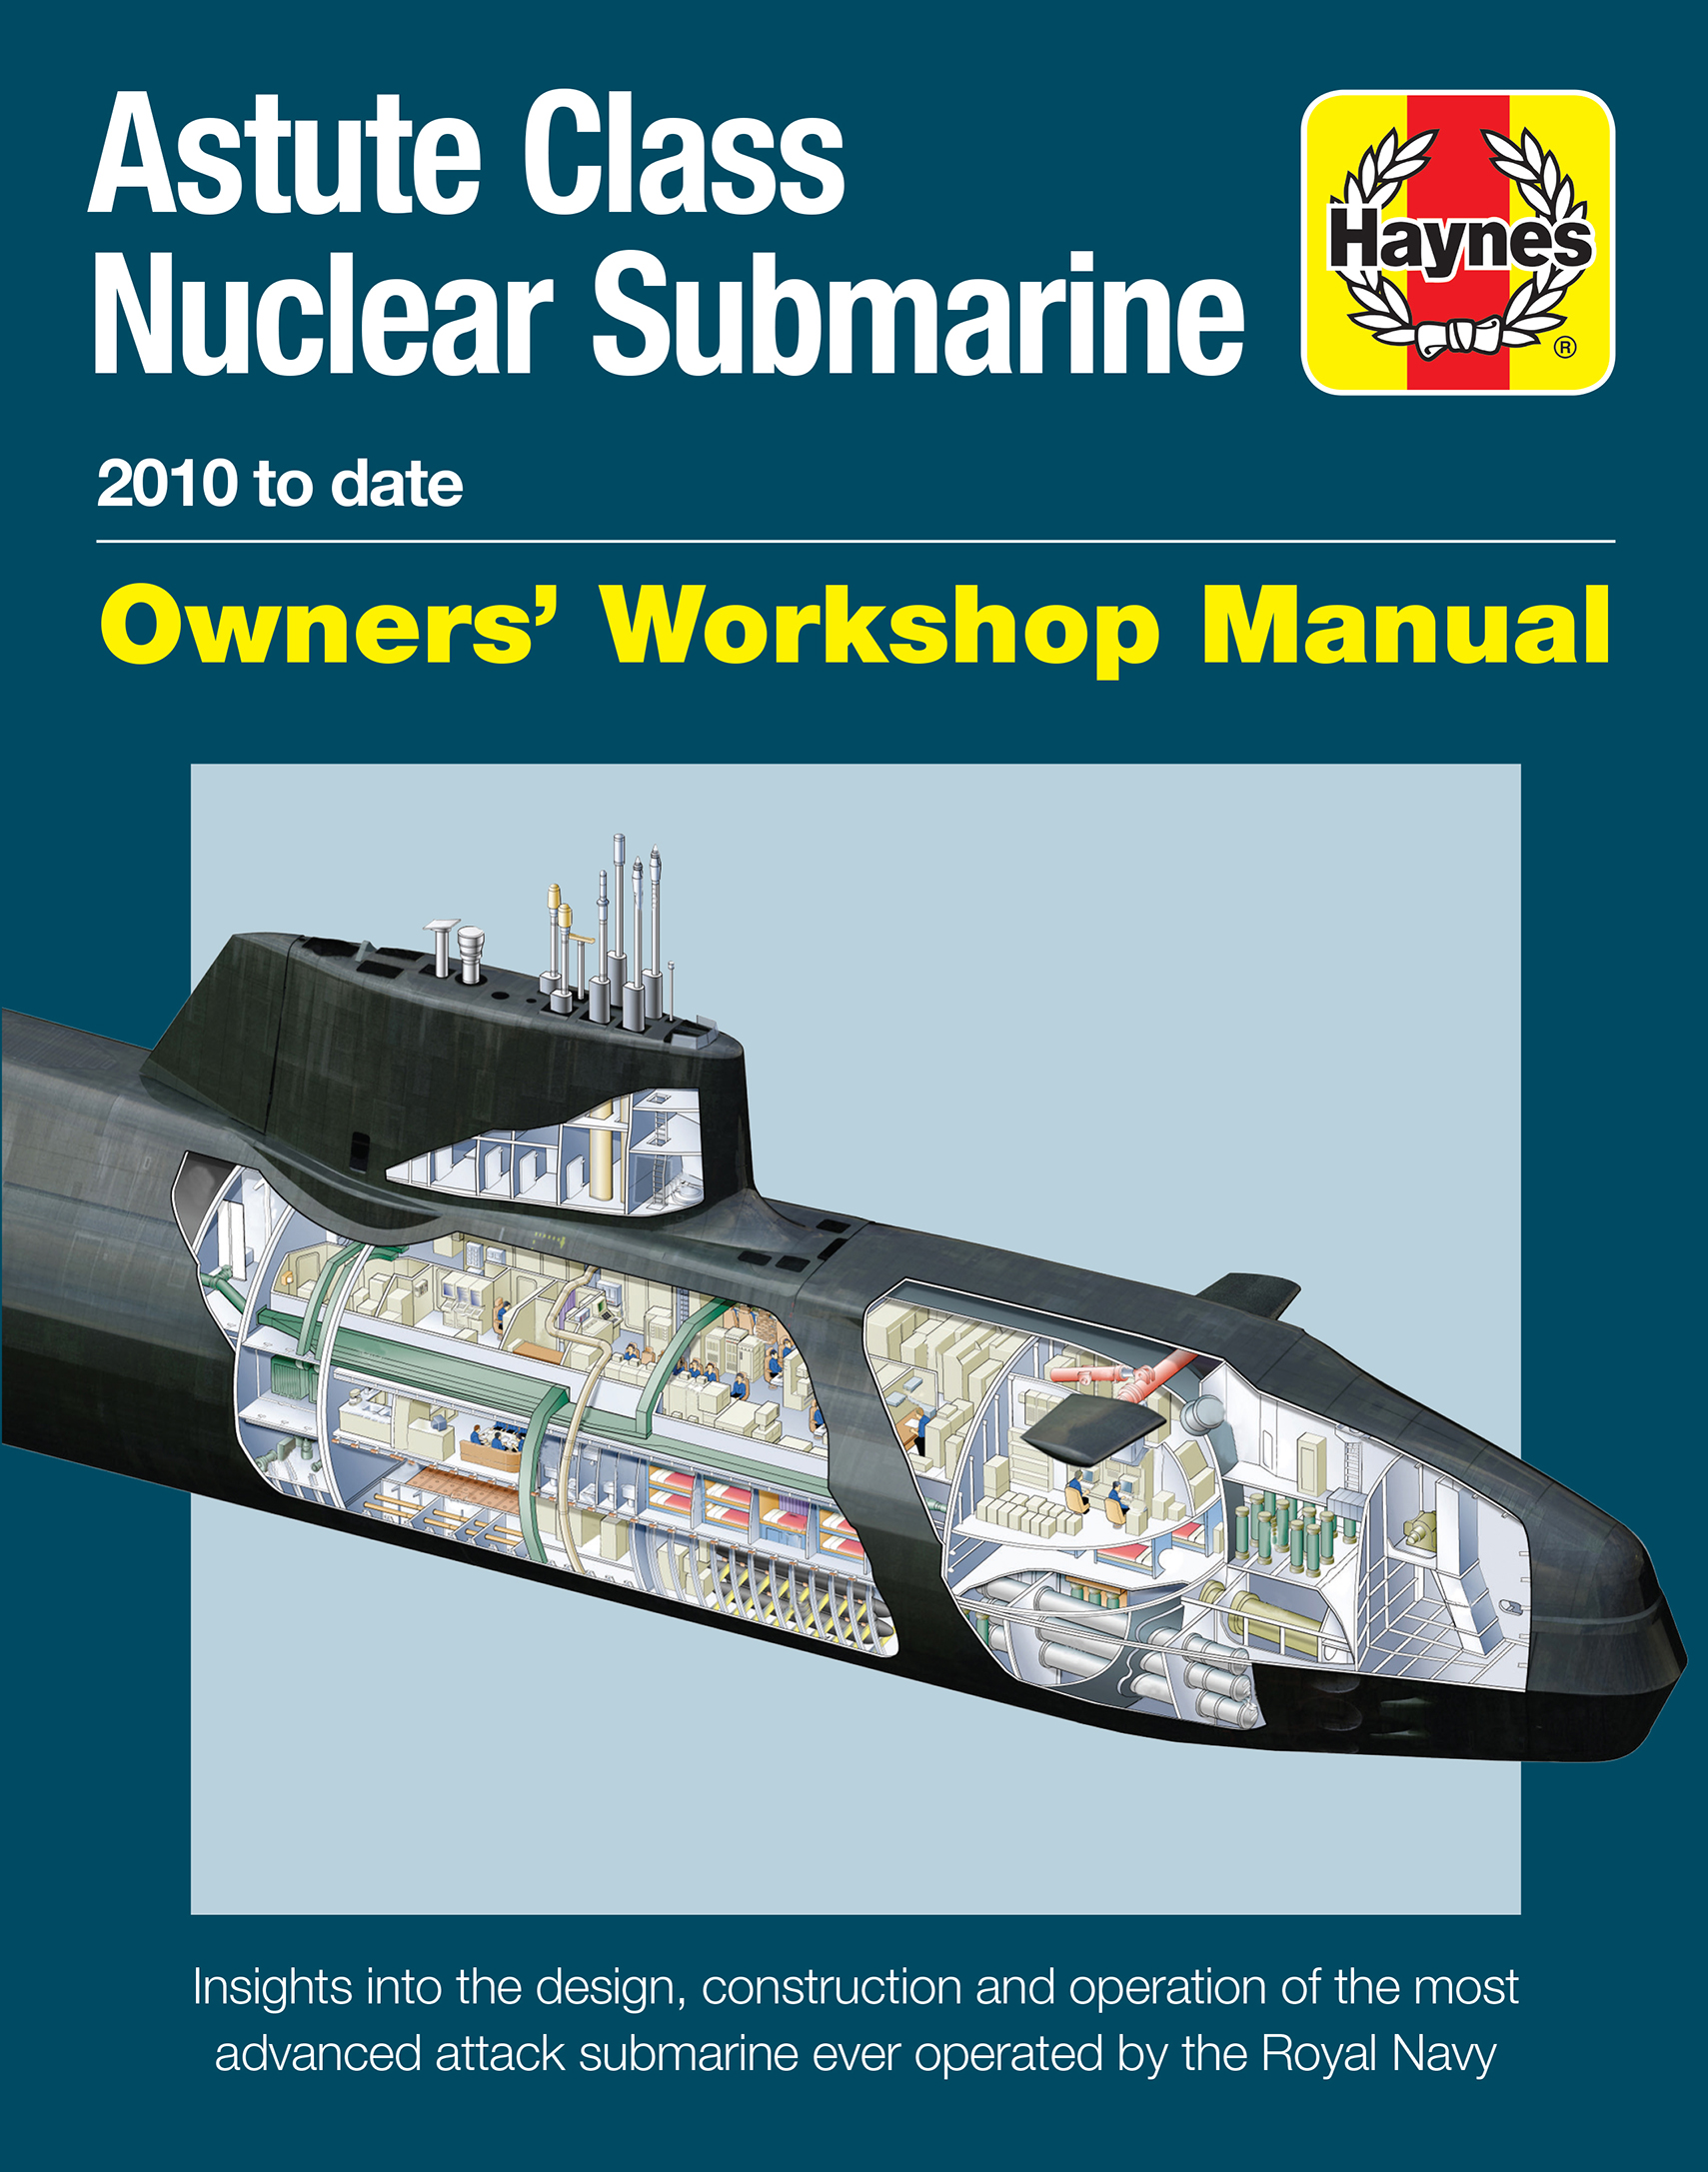 Astute Class Nuclear Submarine Manual